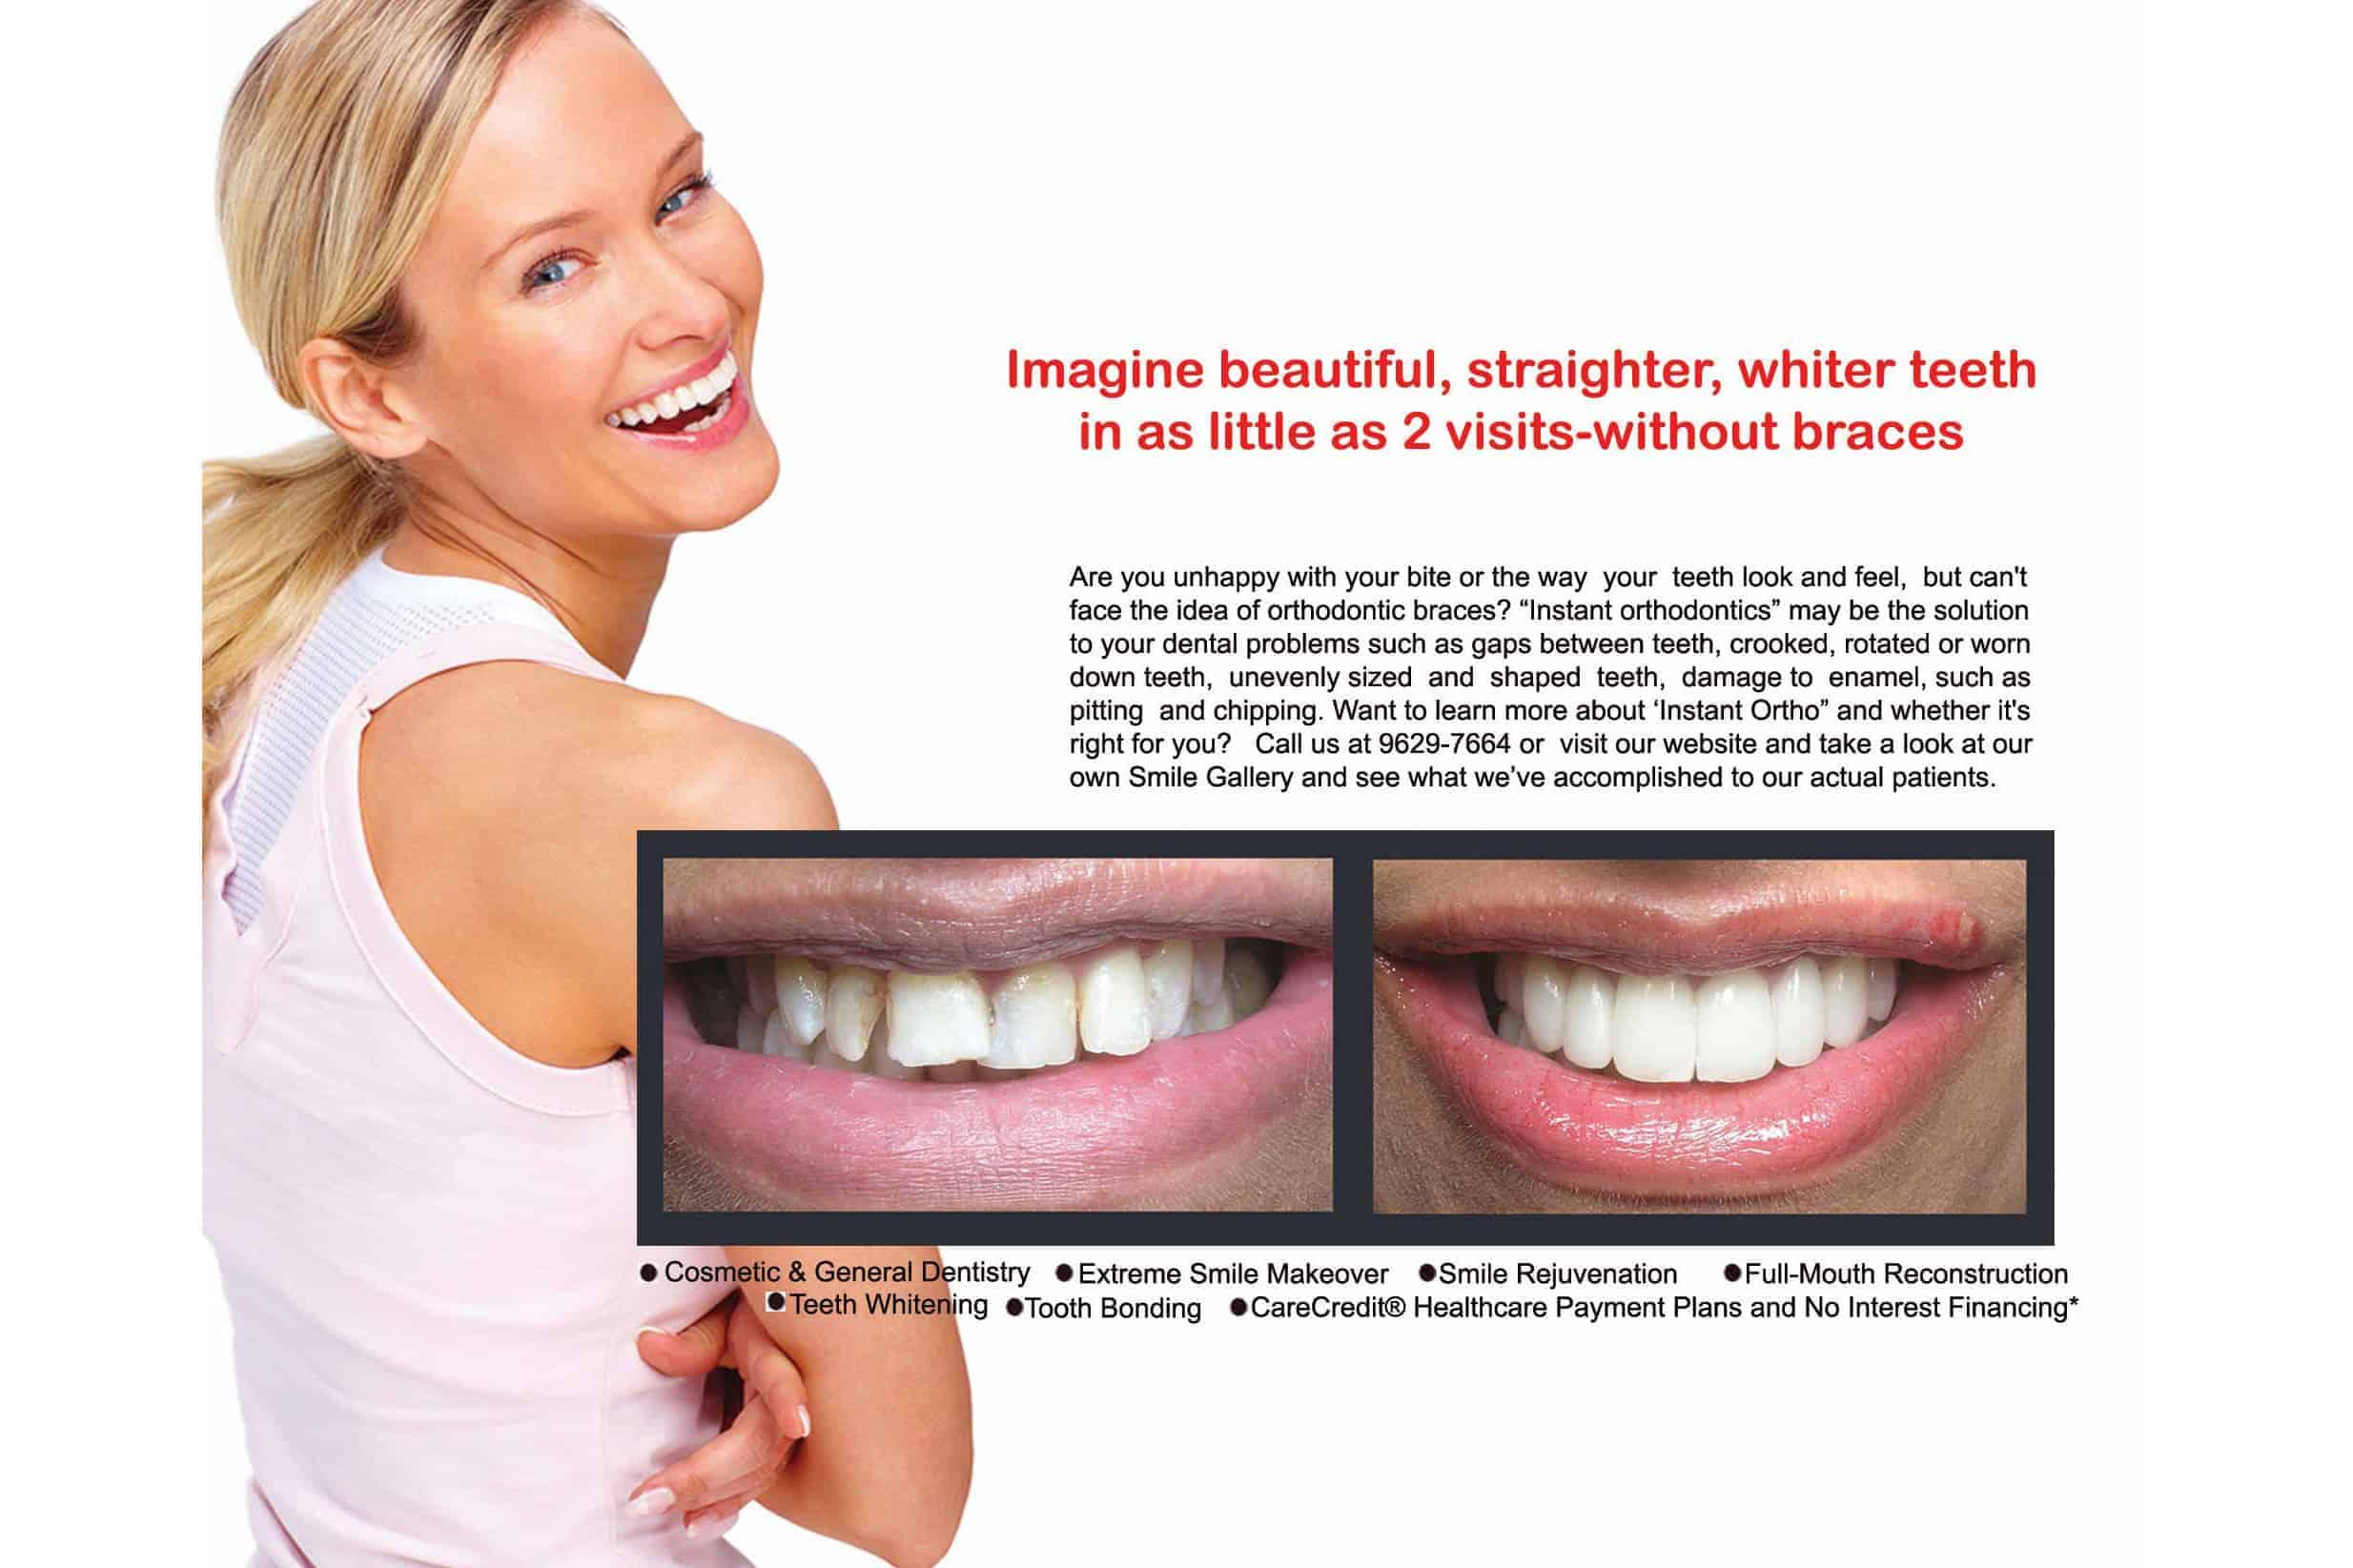 Best Cosmetic Dentist Melbourne #1 Cosmetic Dentist in Melbourne Australia Dr Zenaidy Castro